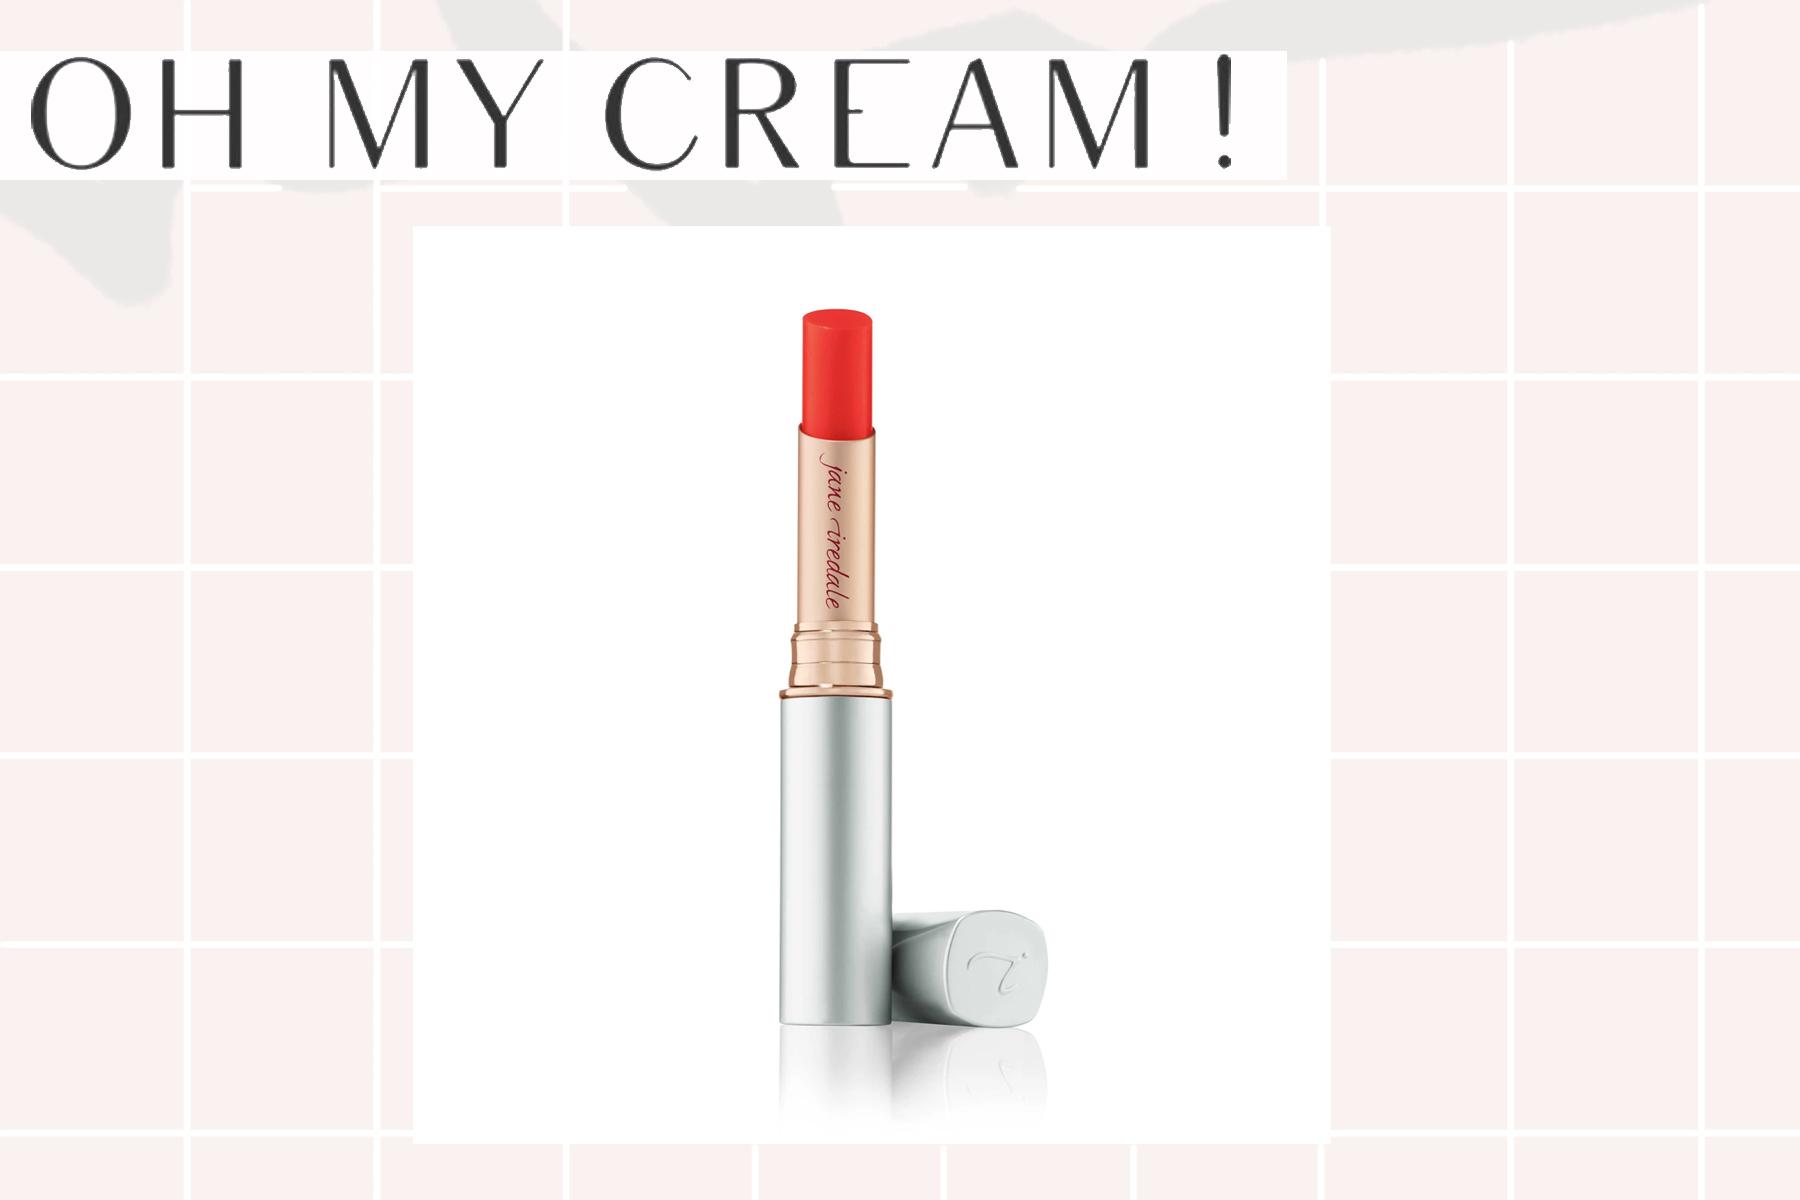 calendrier-de-lavent-oh-my-cream-2020-jane-iredale